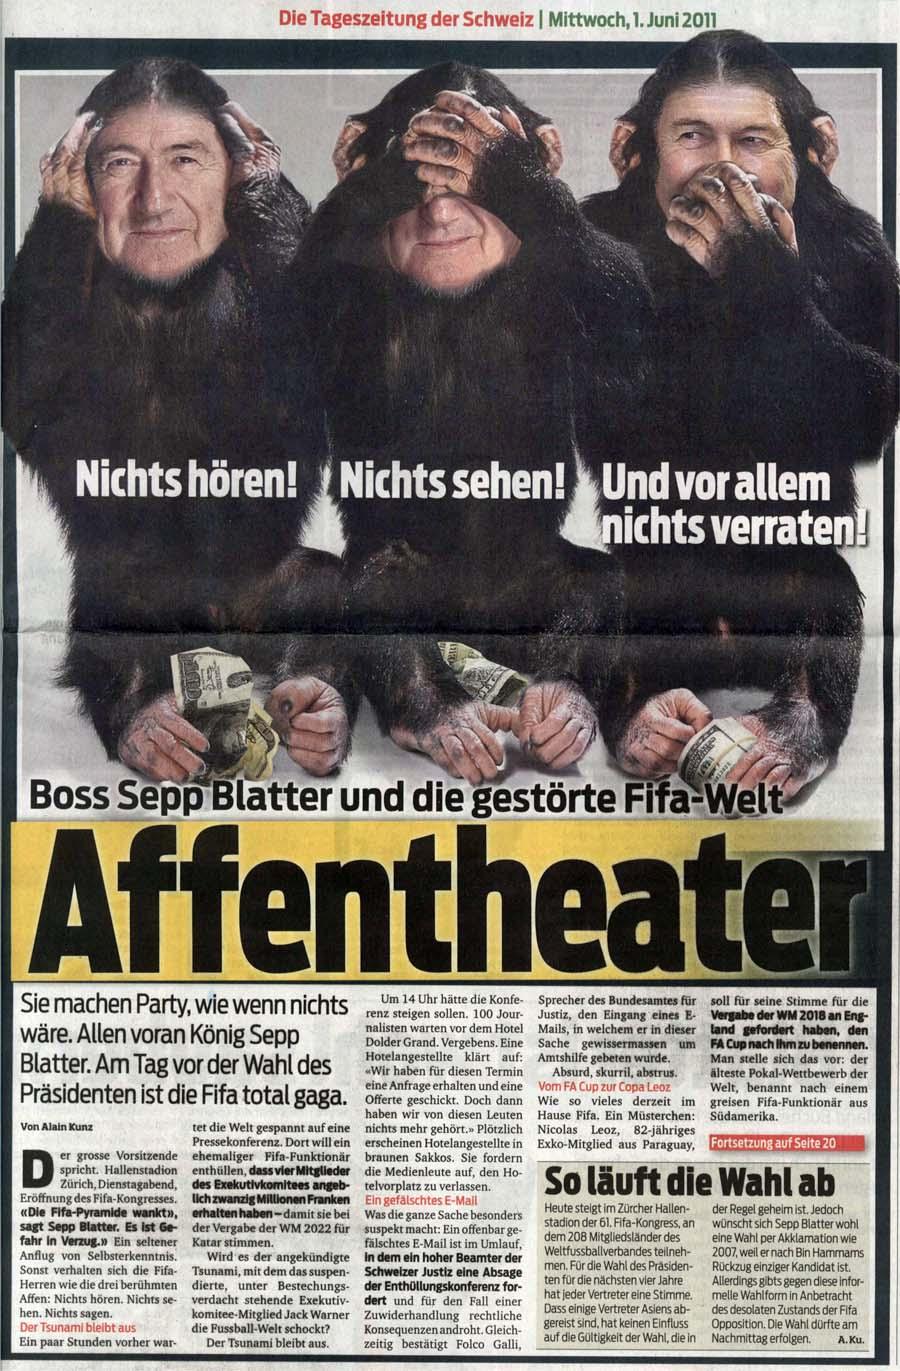 Affentheater um Sepp Blatter: Die gestörte Fifa Welt